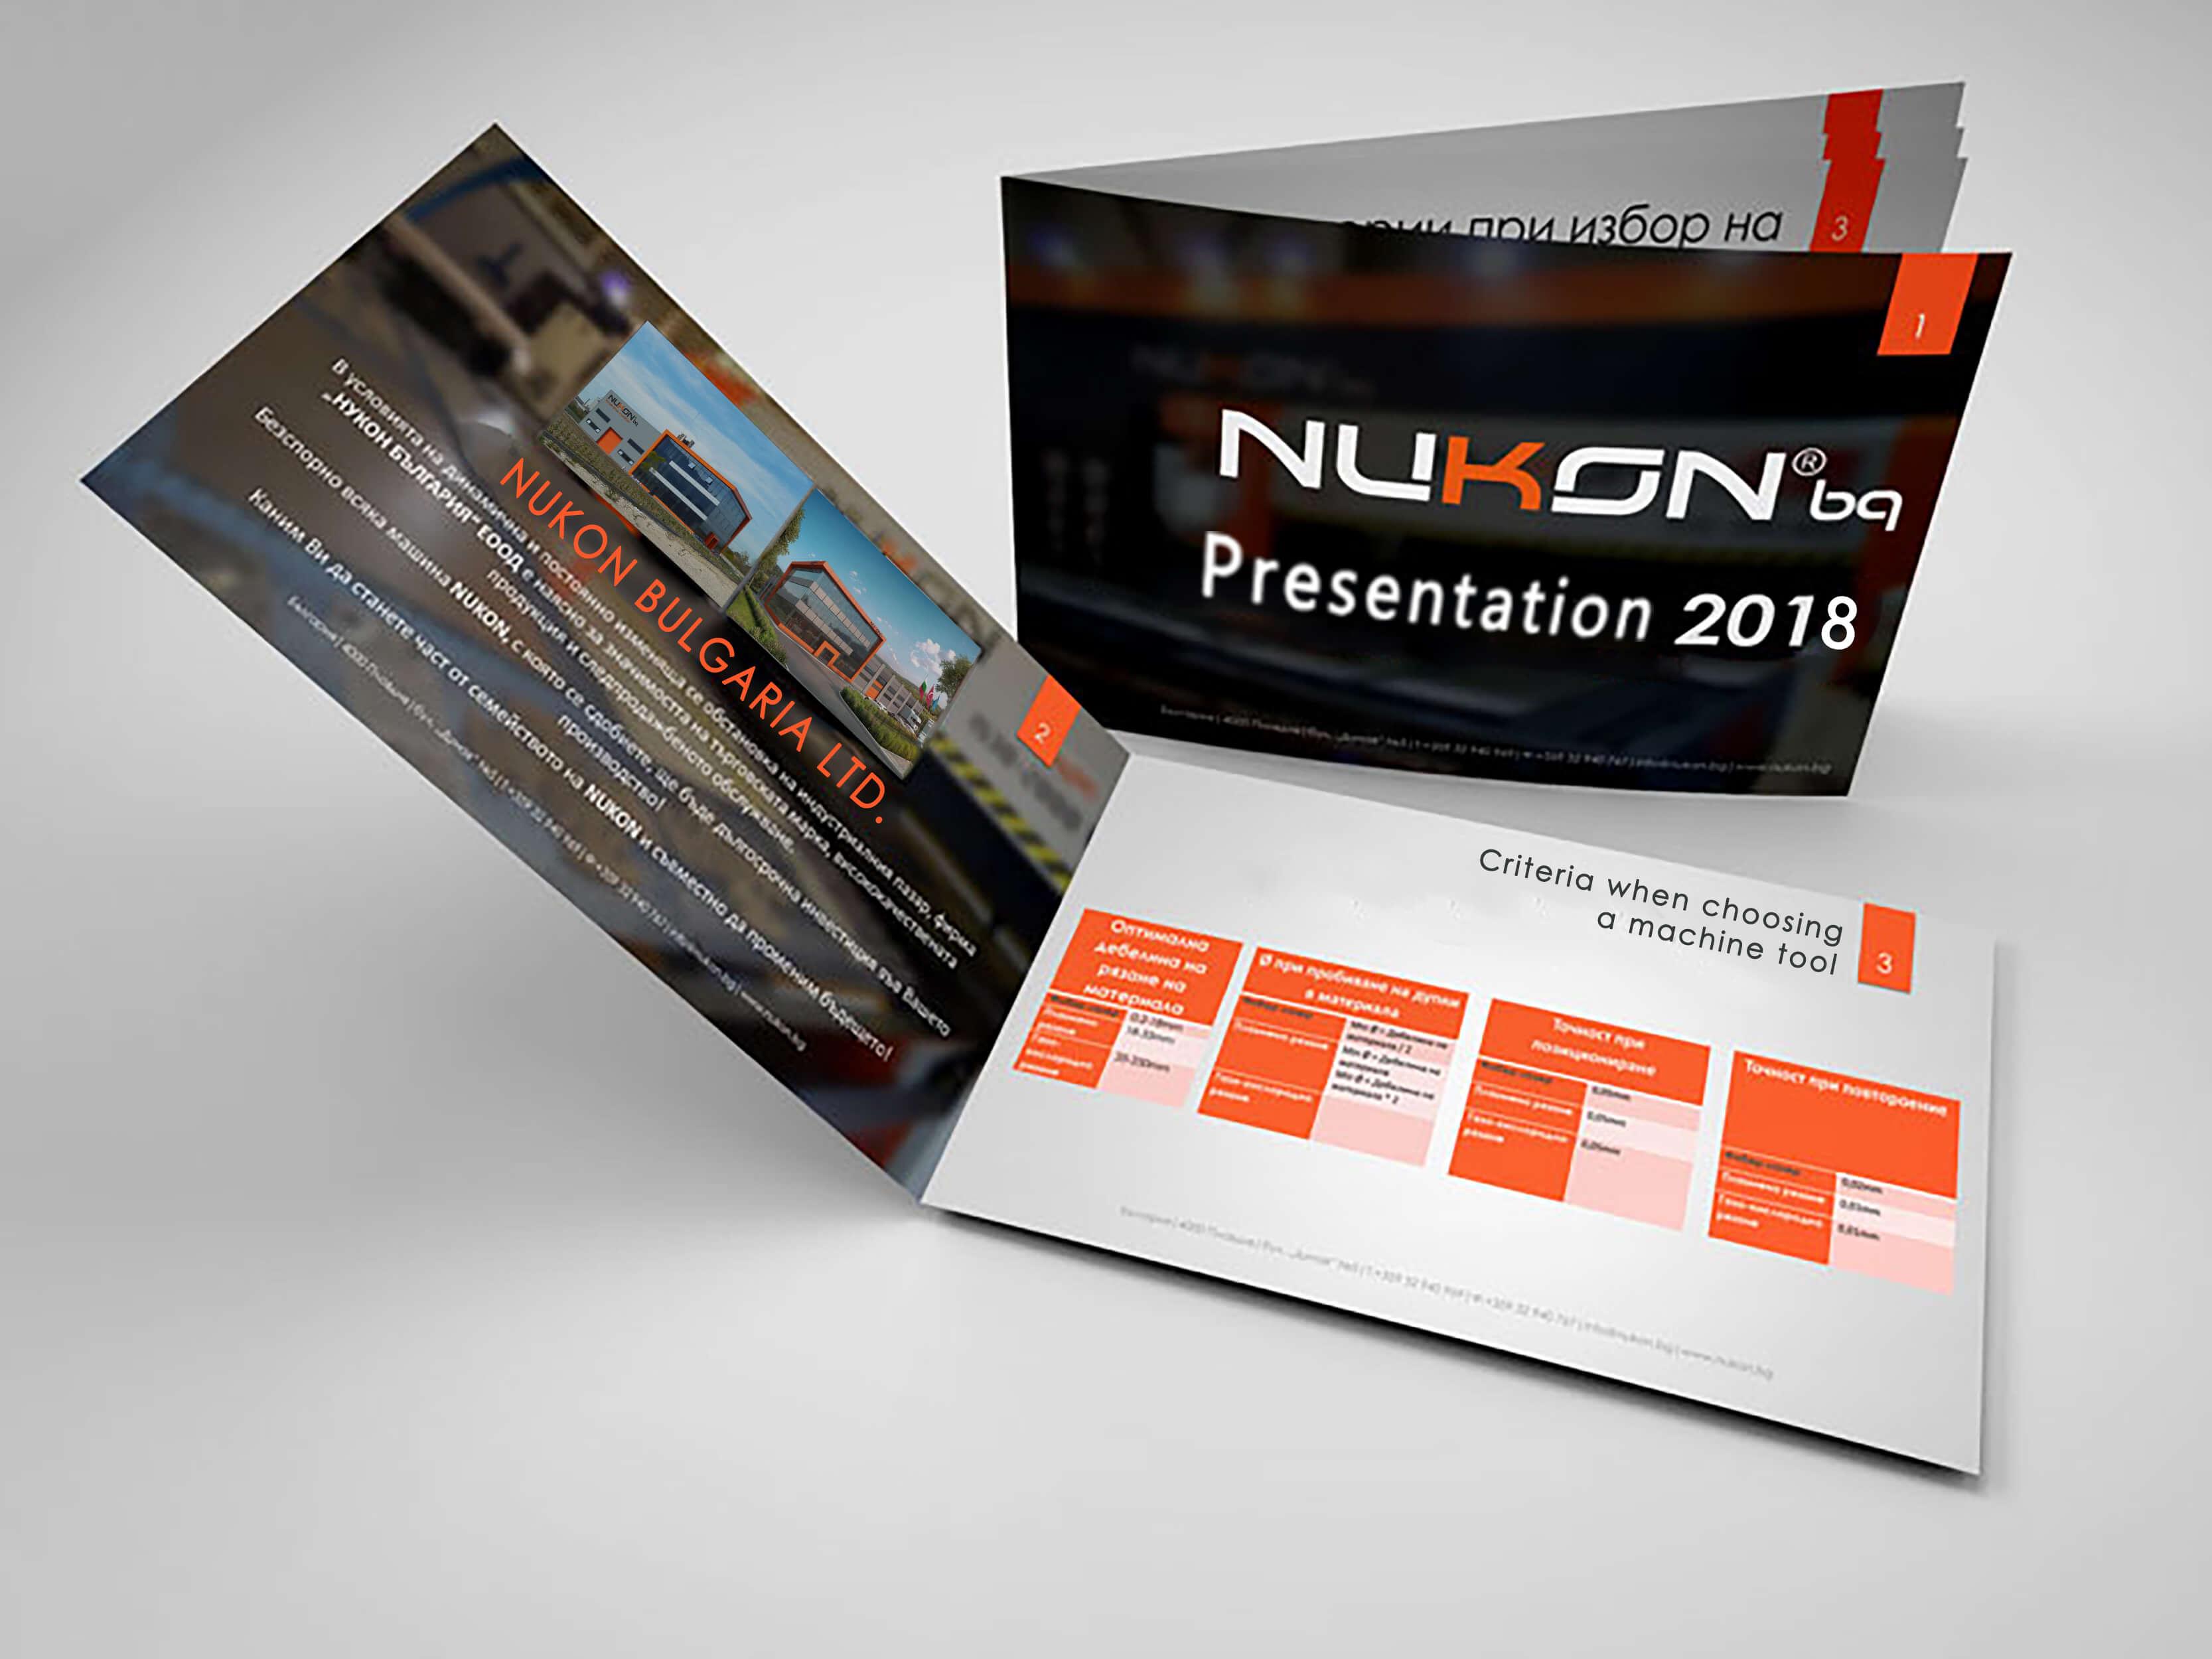 NukonBGPresentationDisplay2018